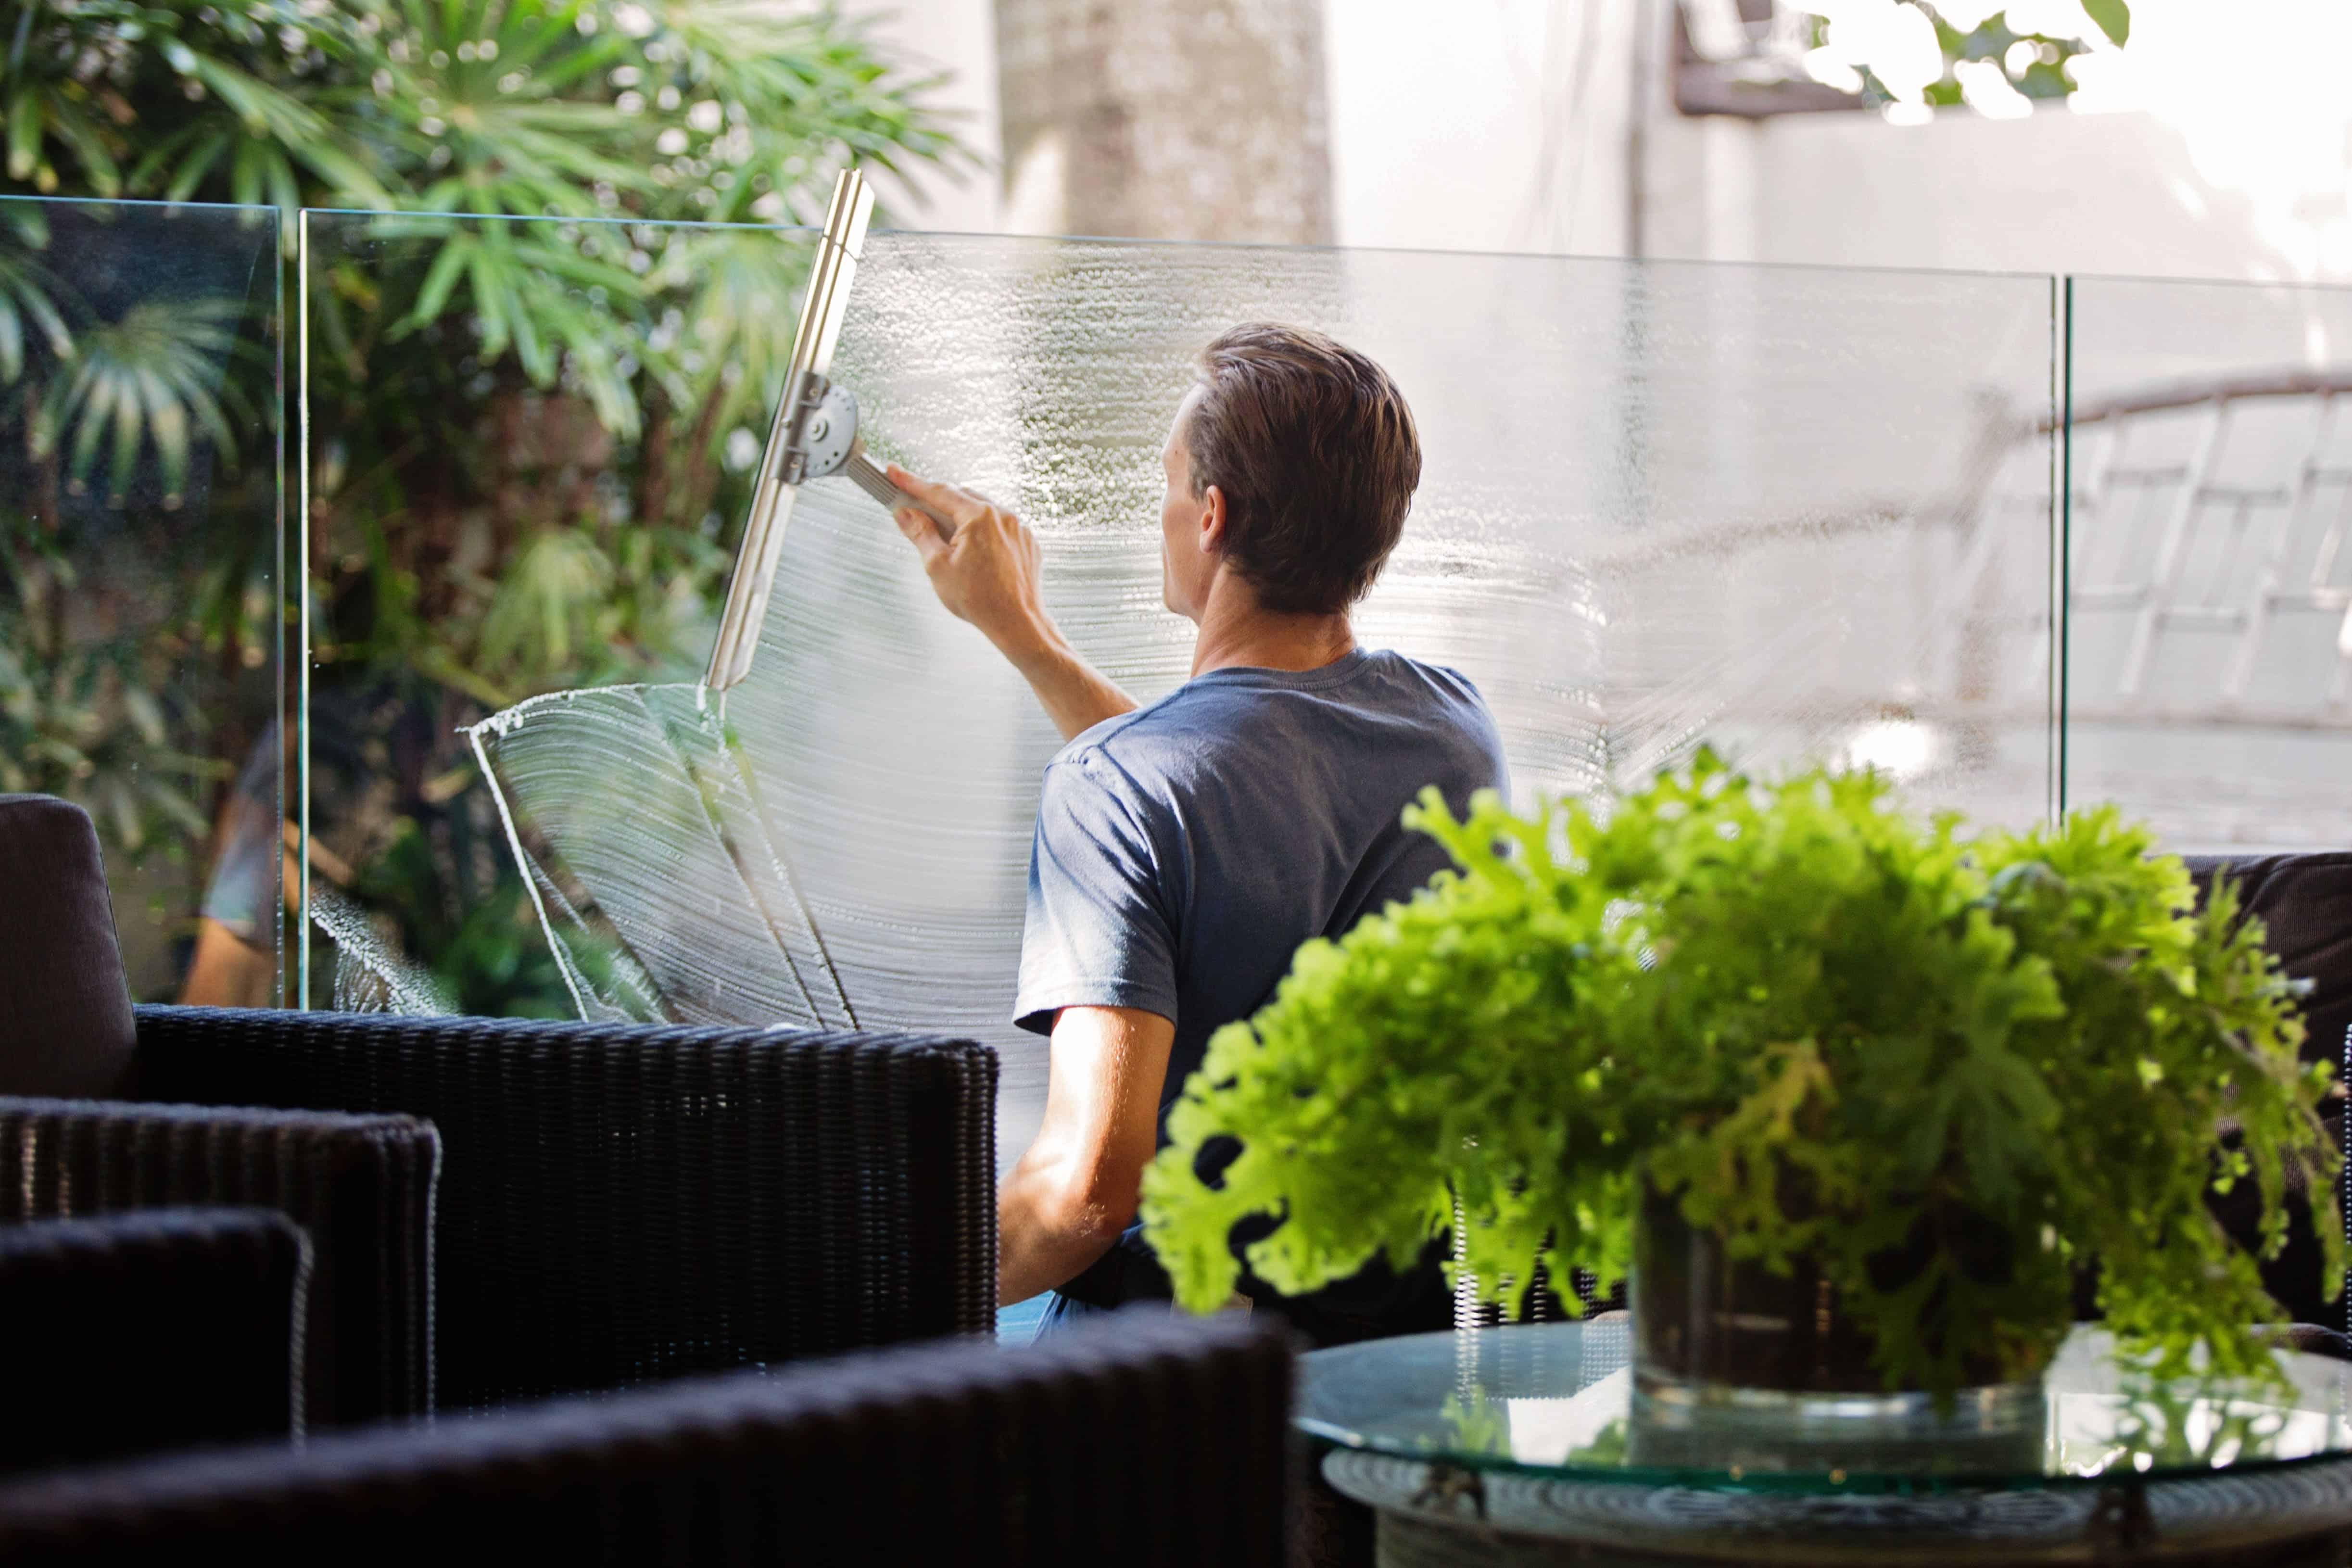 man-in-gray-shirt-cleaning-clear-glass-wall-near-sofa-713297-min